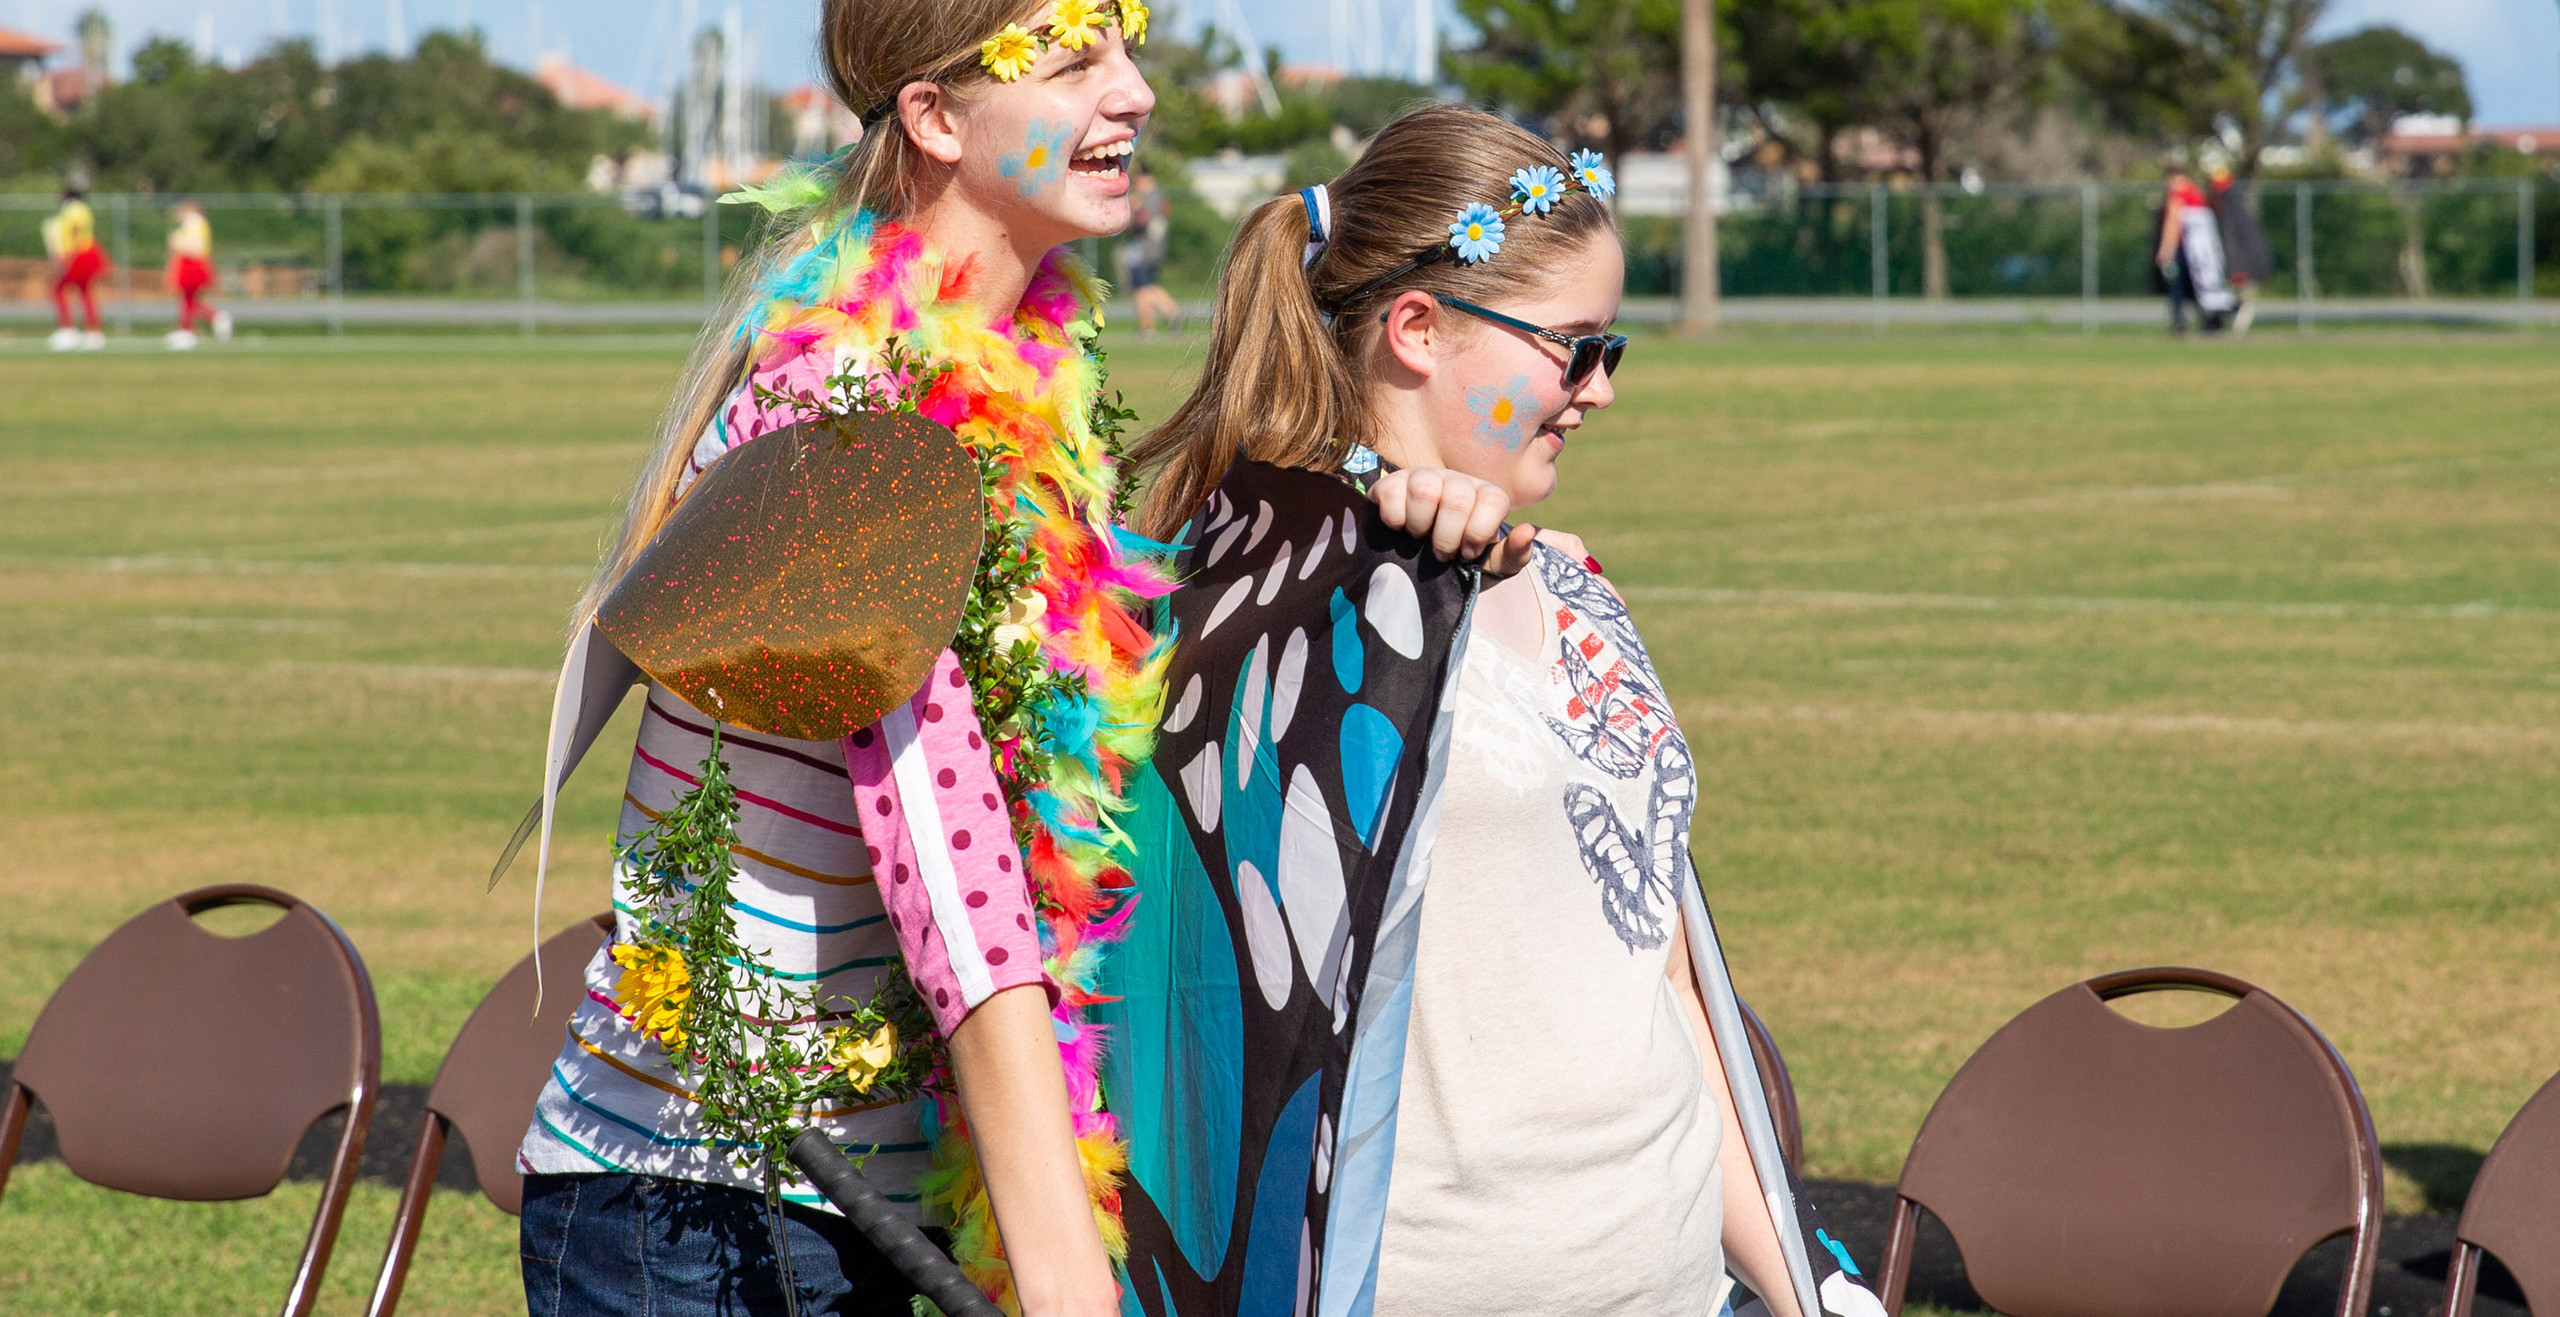 Two freshmen girls dressed as butterflies walking in the parade.